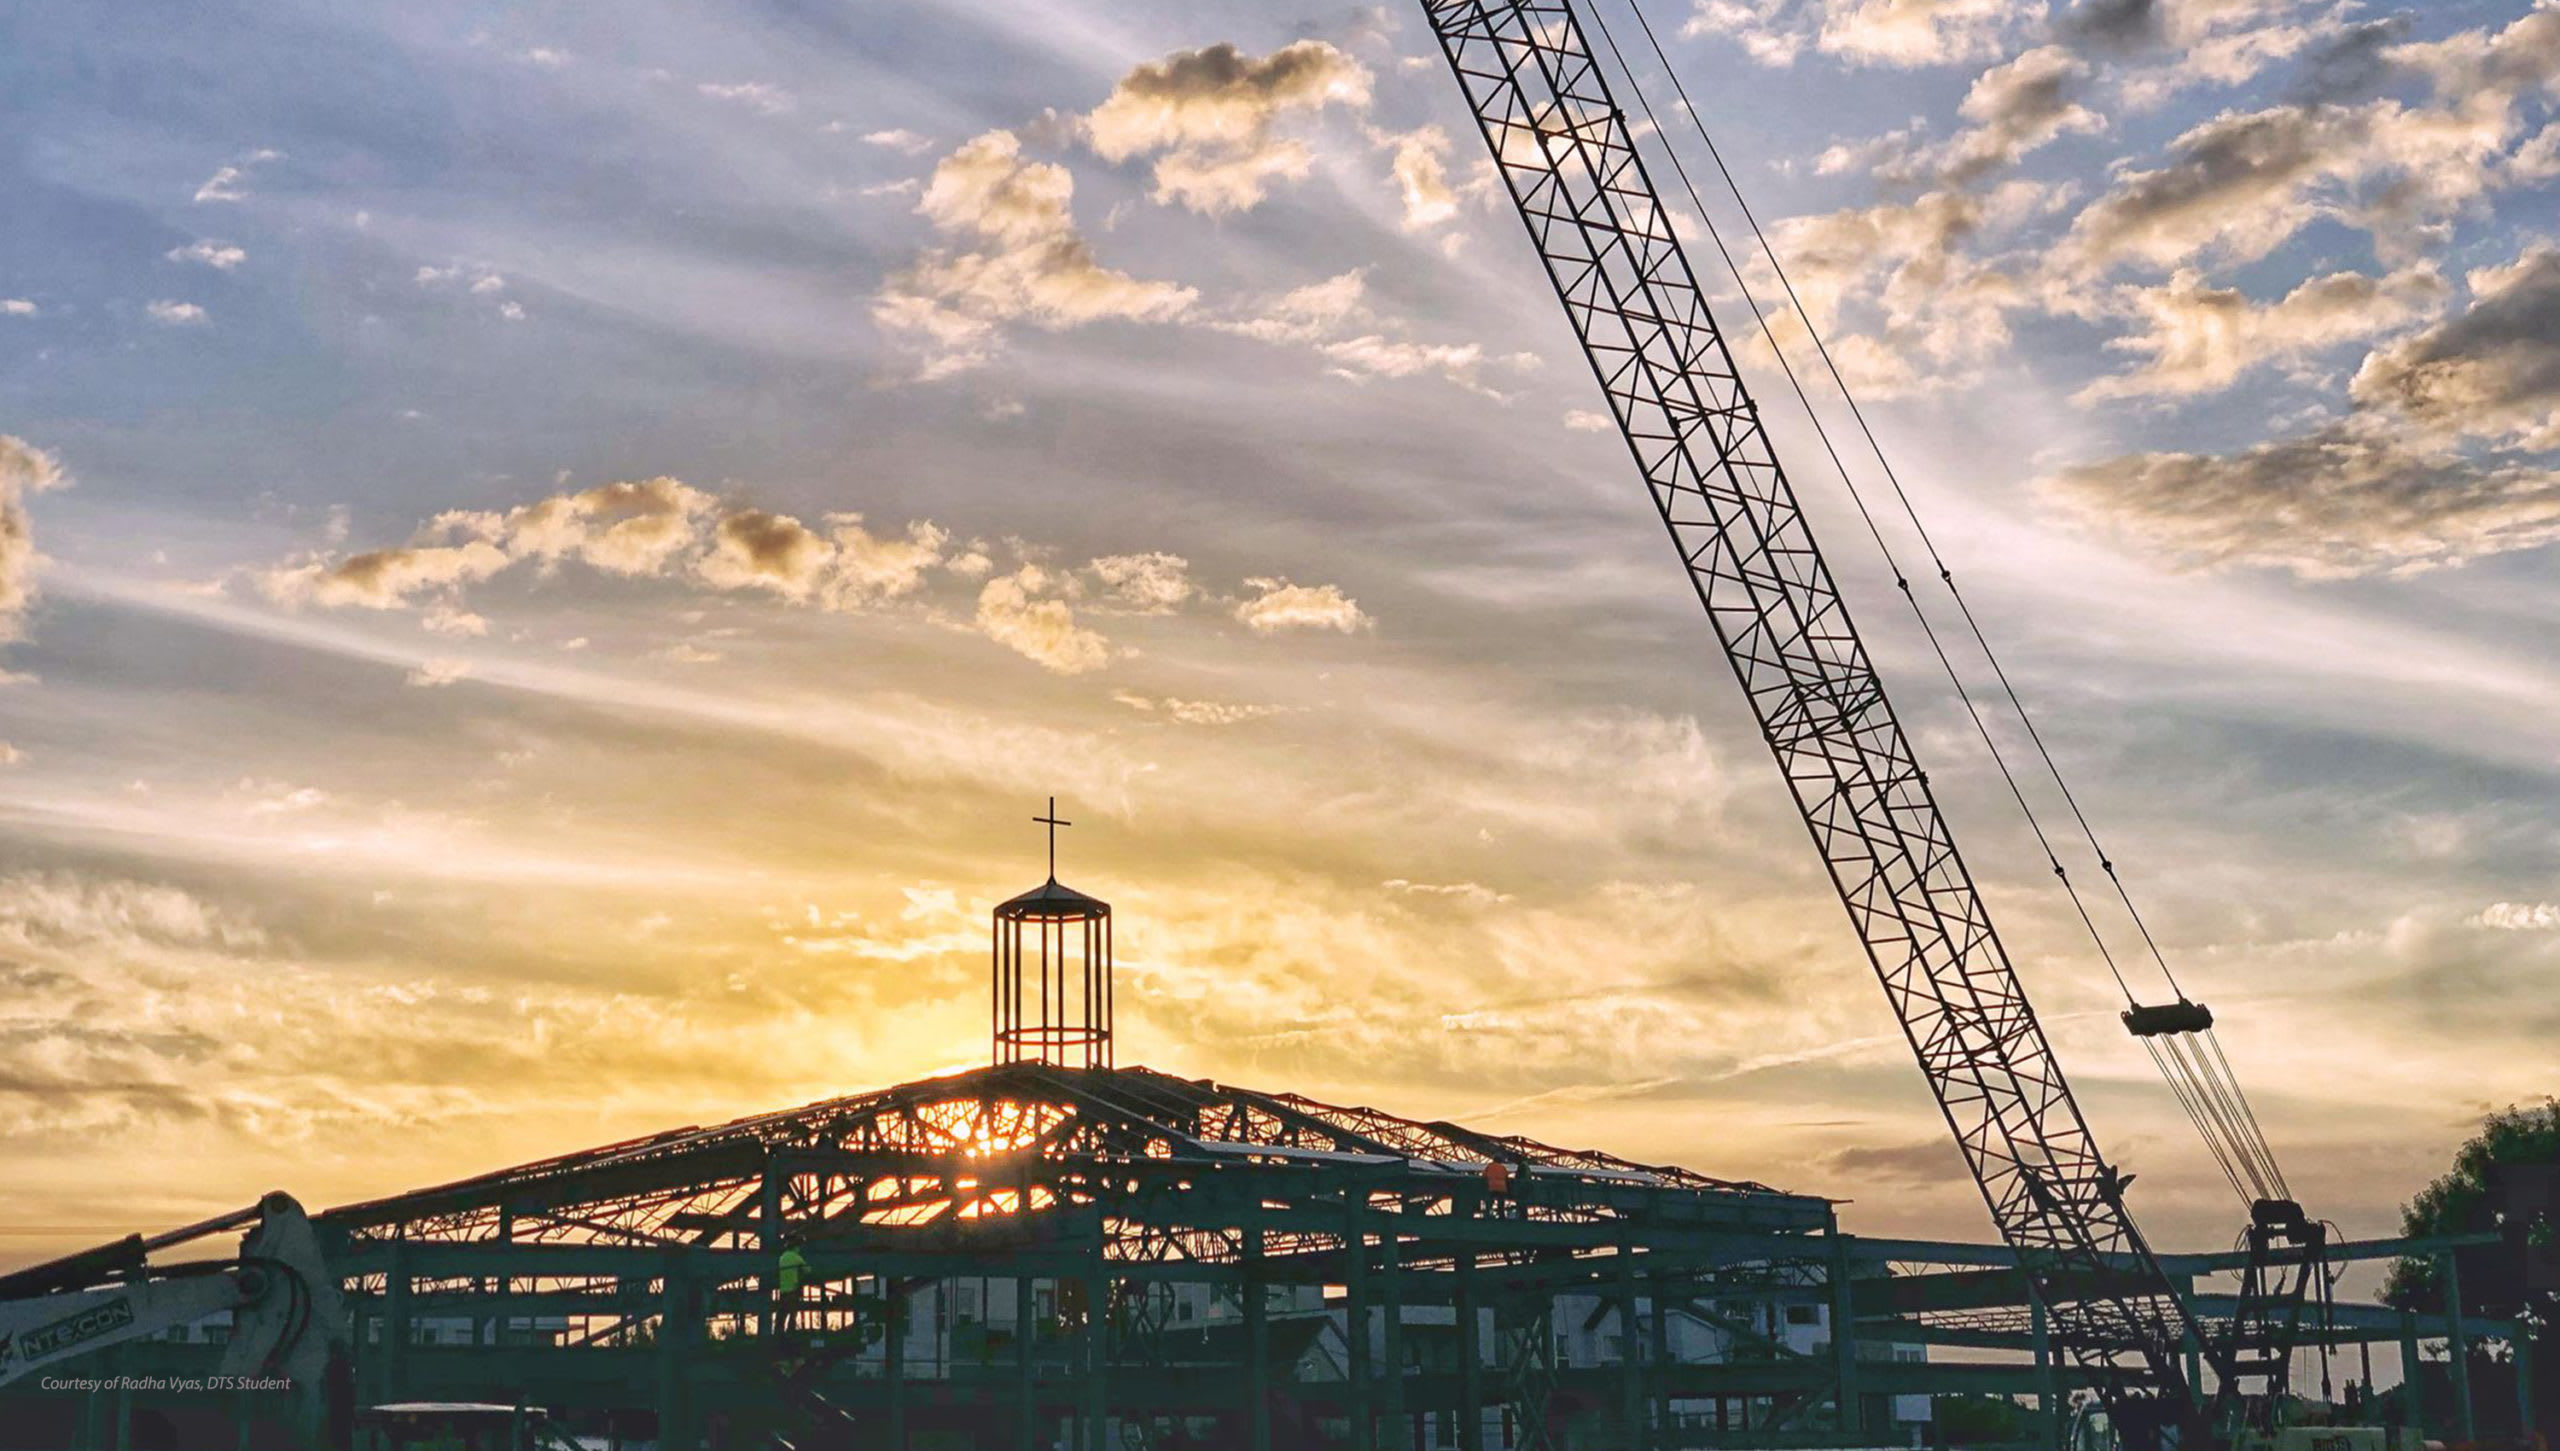 chapel under construction at sunset